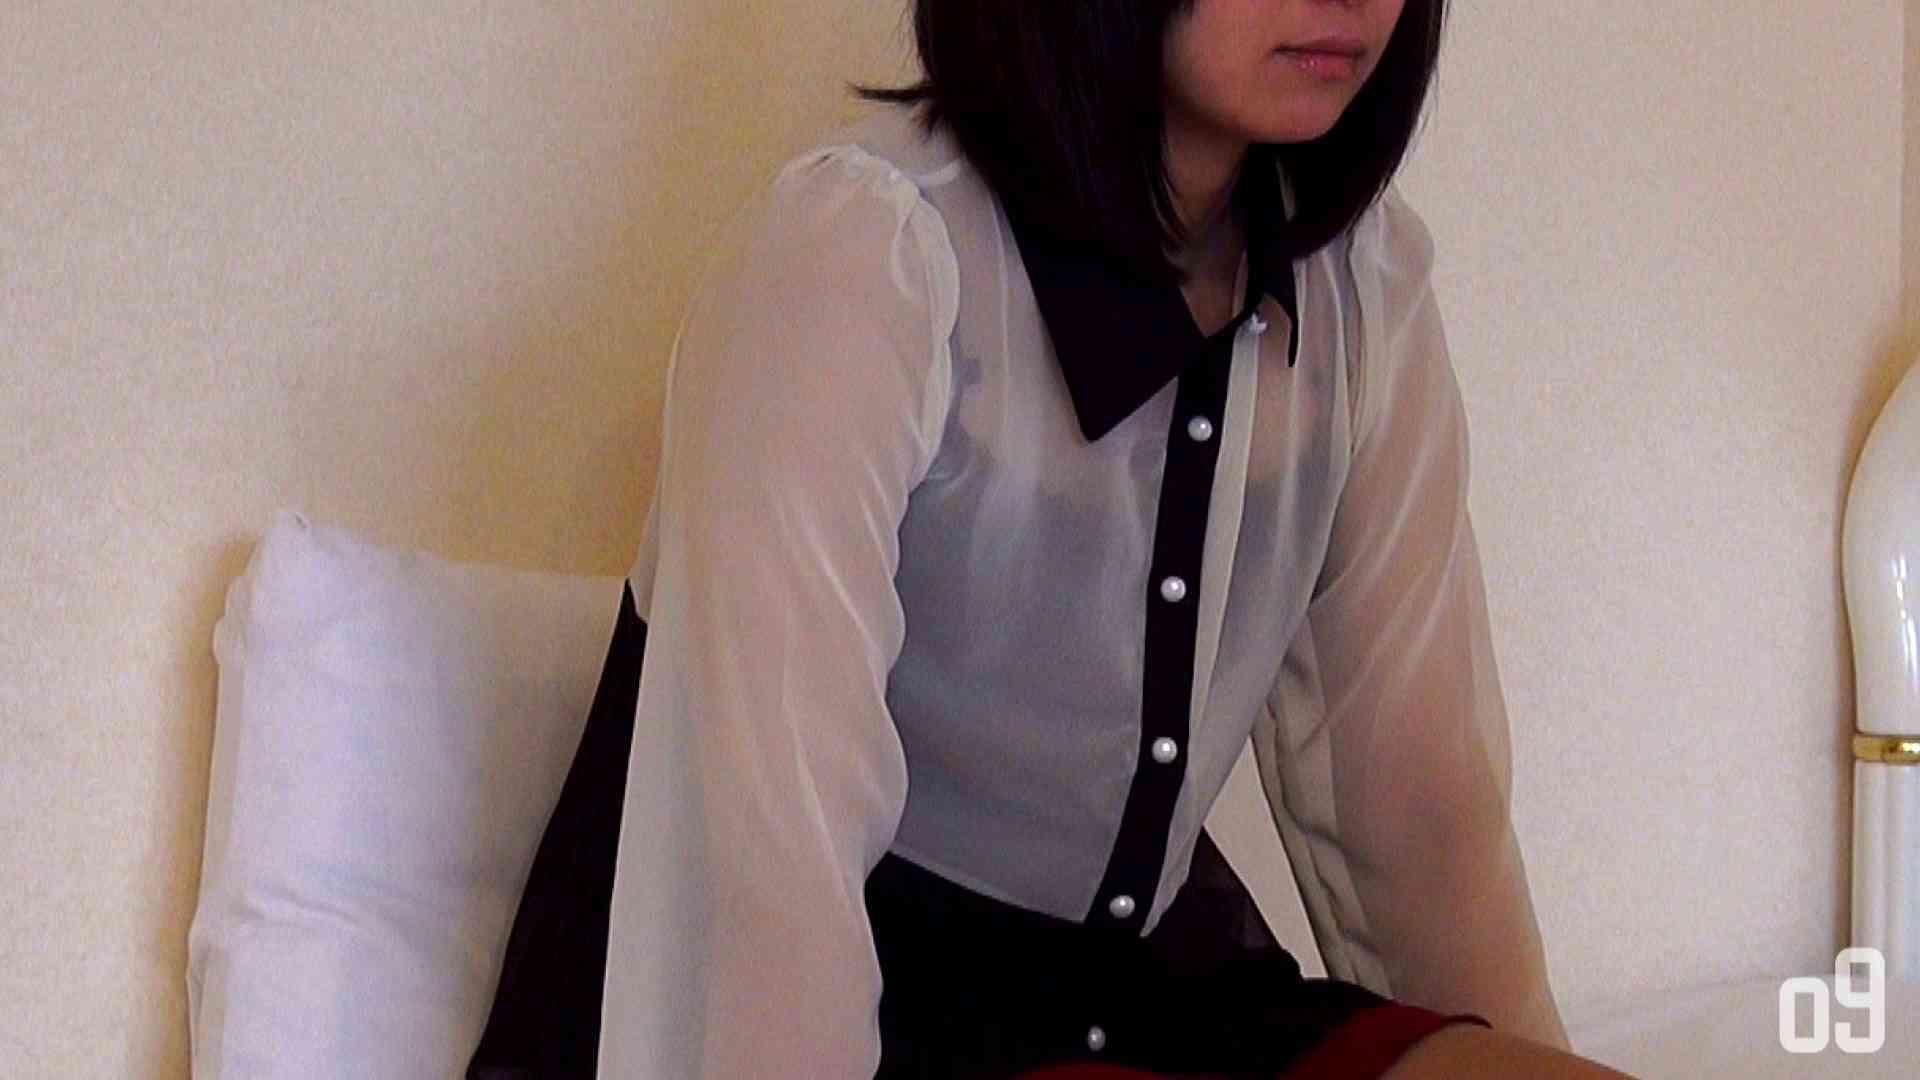 vol.1 撮影内容未確定の中、まずは私服姿撮り エッチなOL | 顔出しNG一般女性  80pic 1